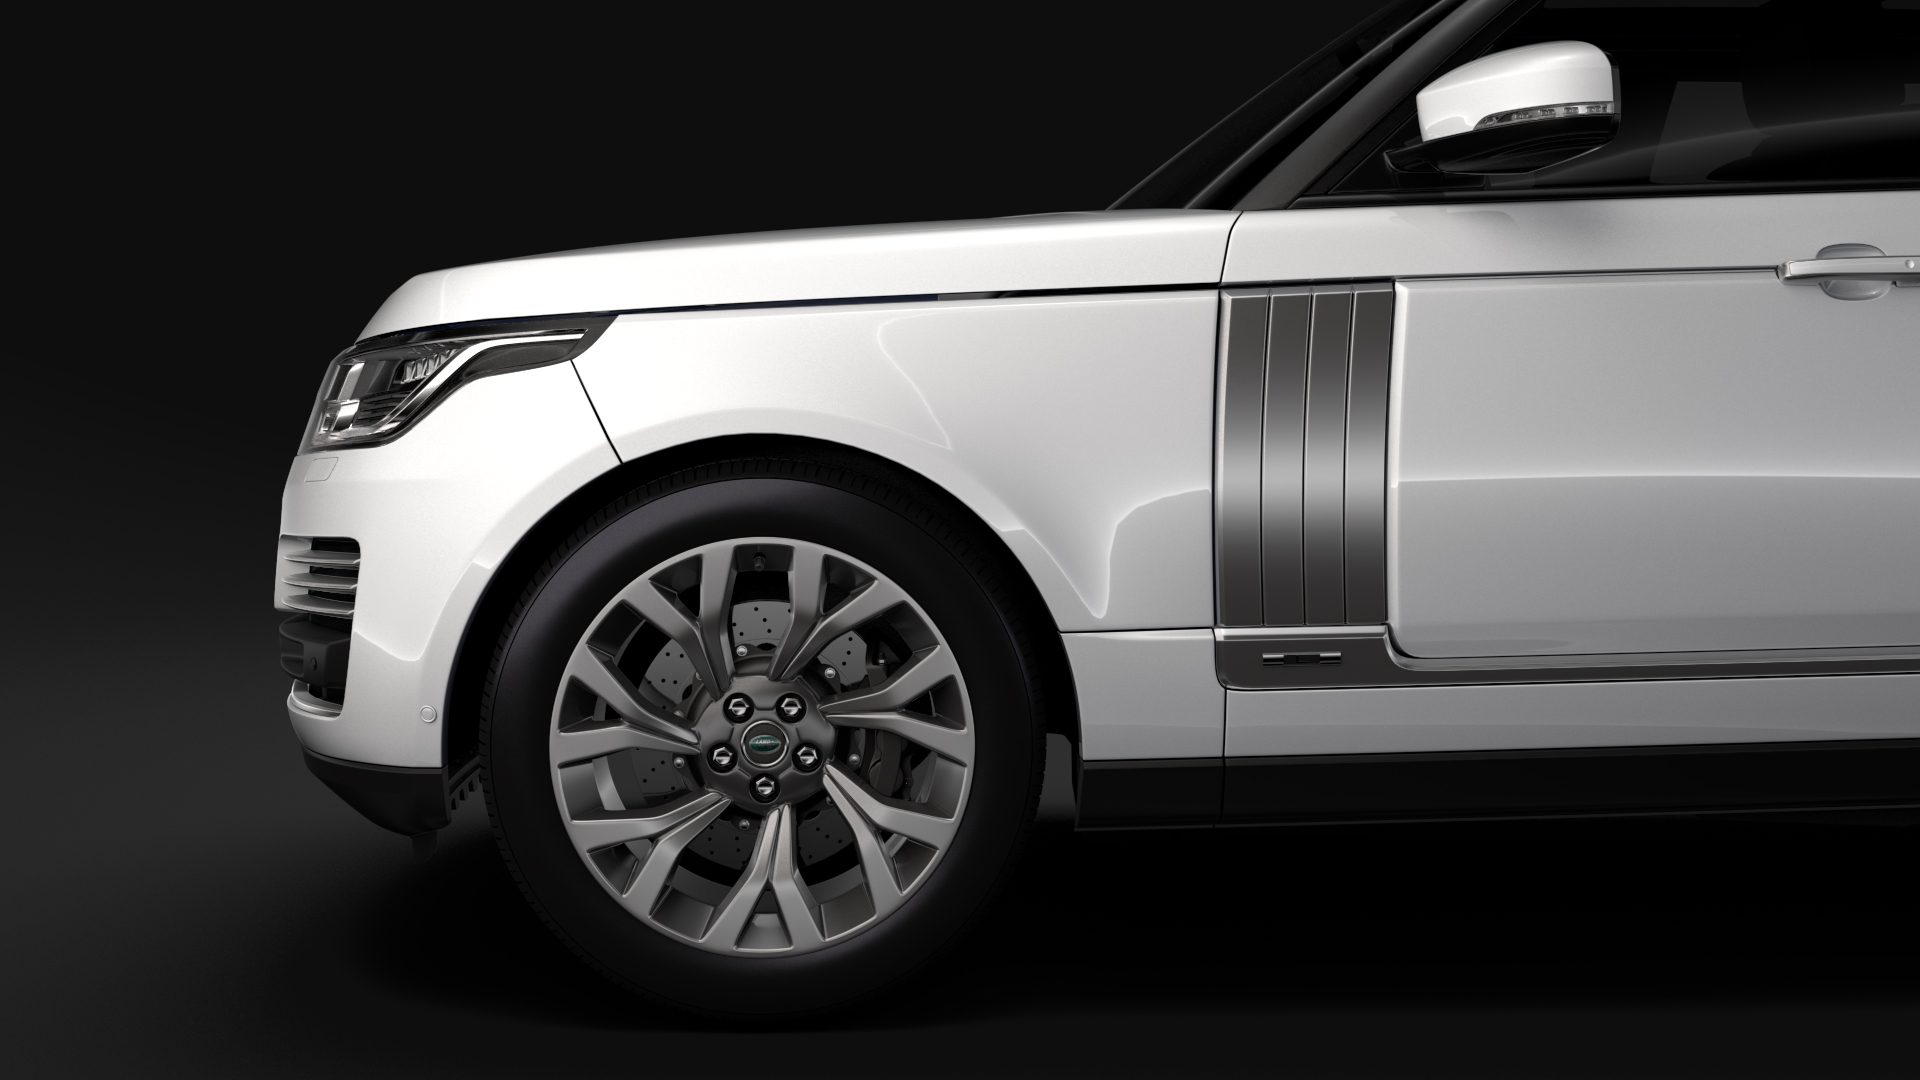 range rover autobiography p400e lwb l405 2018 3d model fbx c4d lwo ma mb hrc xsi obj 277362